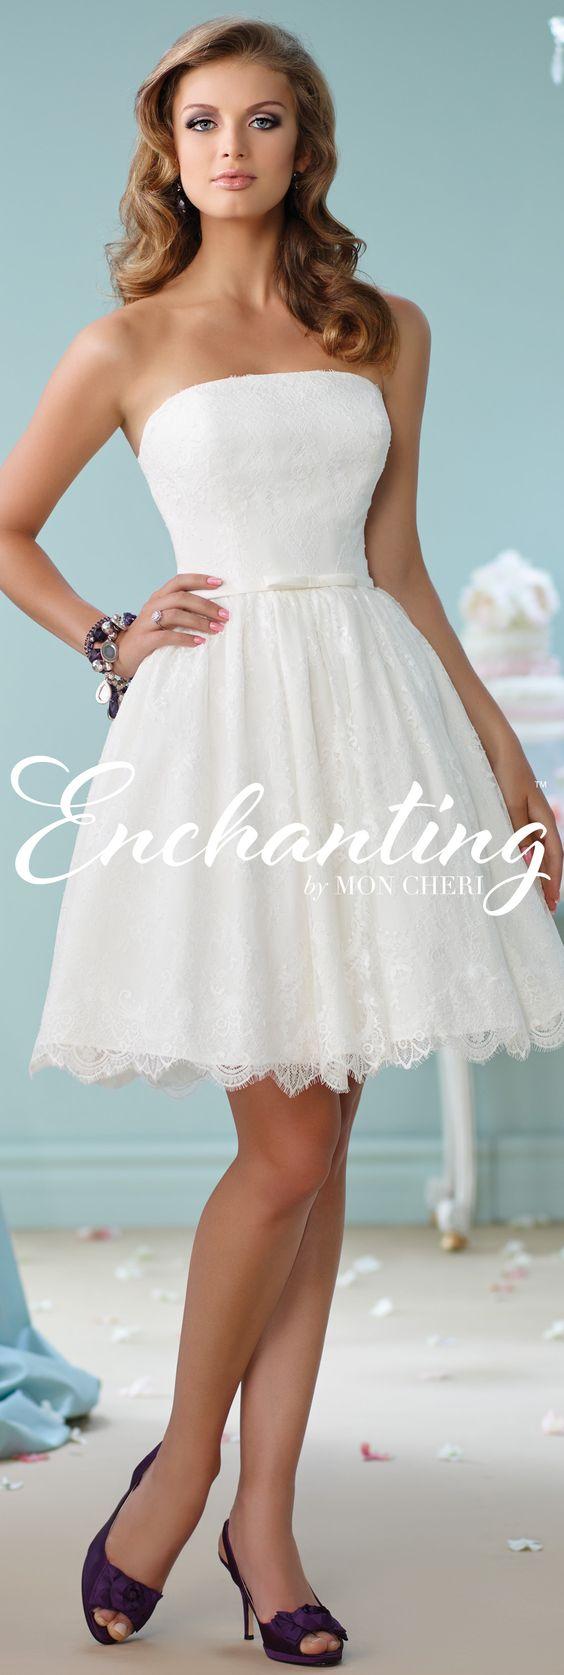 Enchanting by Mon Cheri Spring 2016 ~Style No. 116122 #shortweddingdress